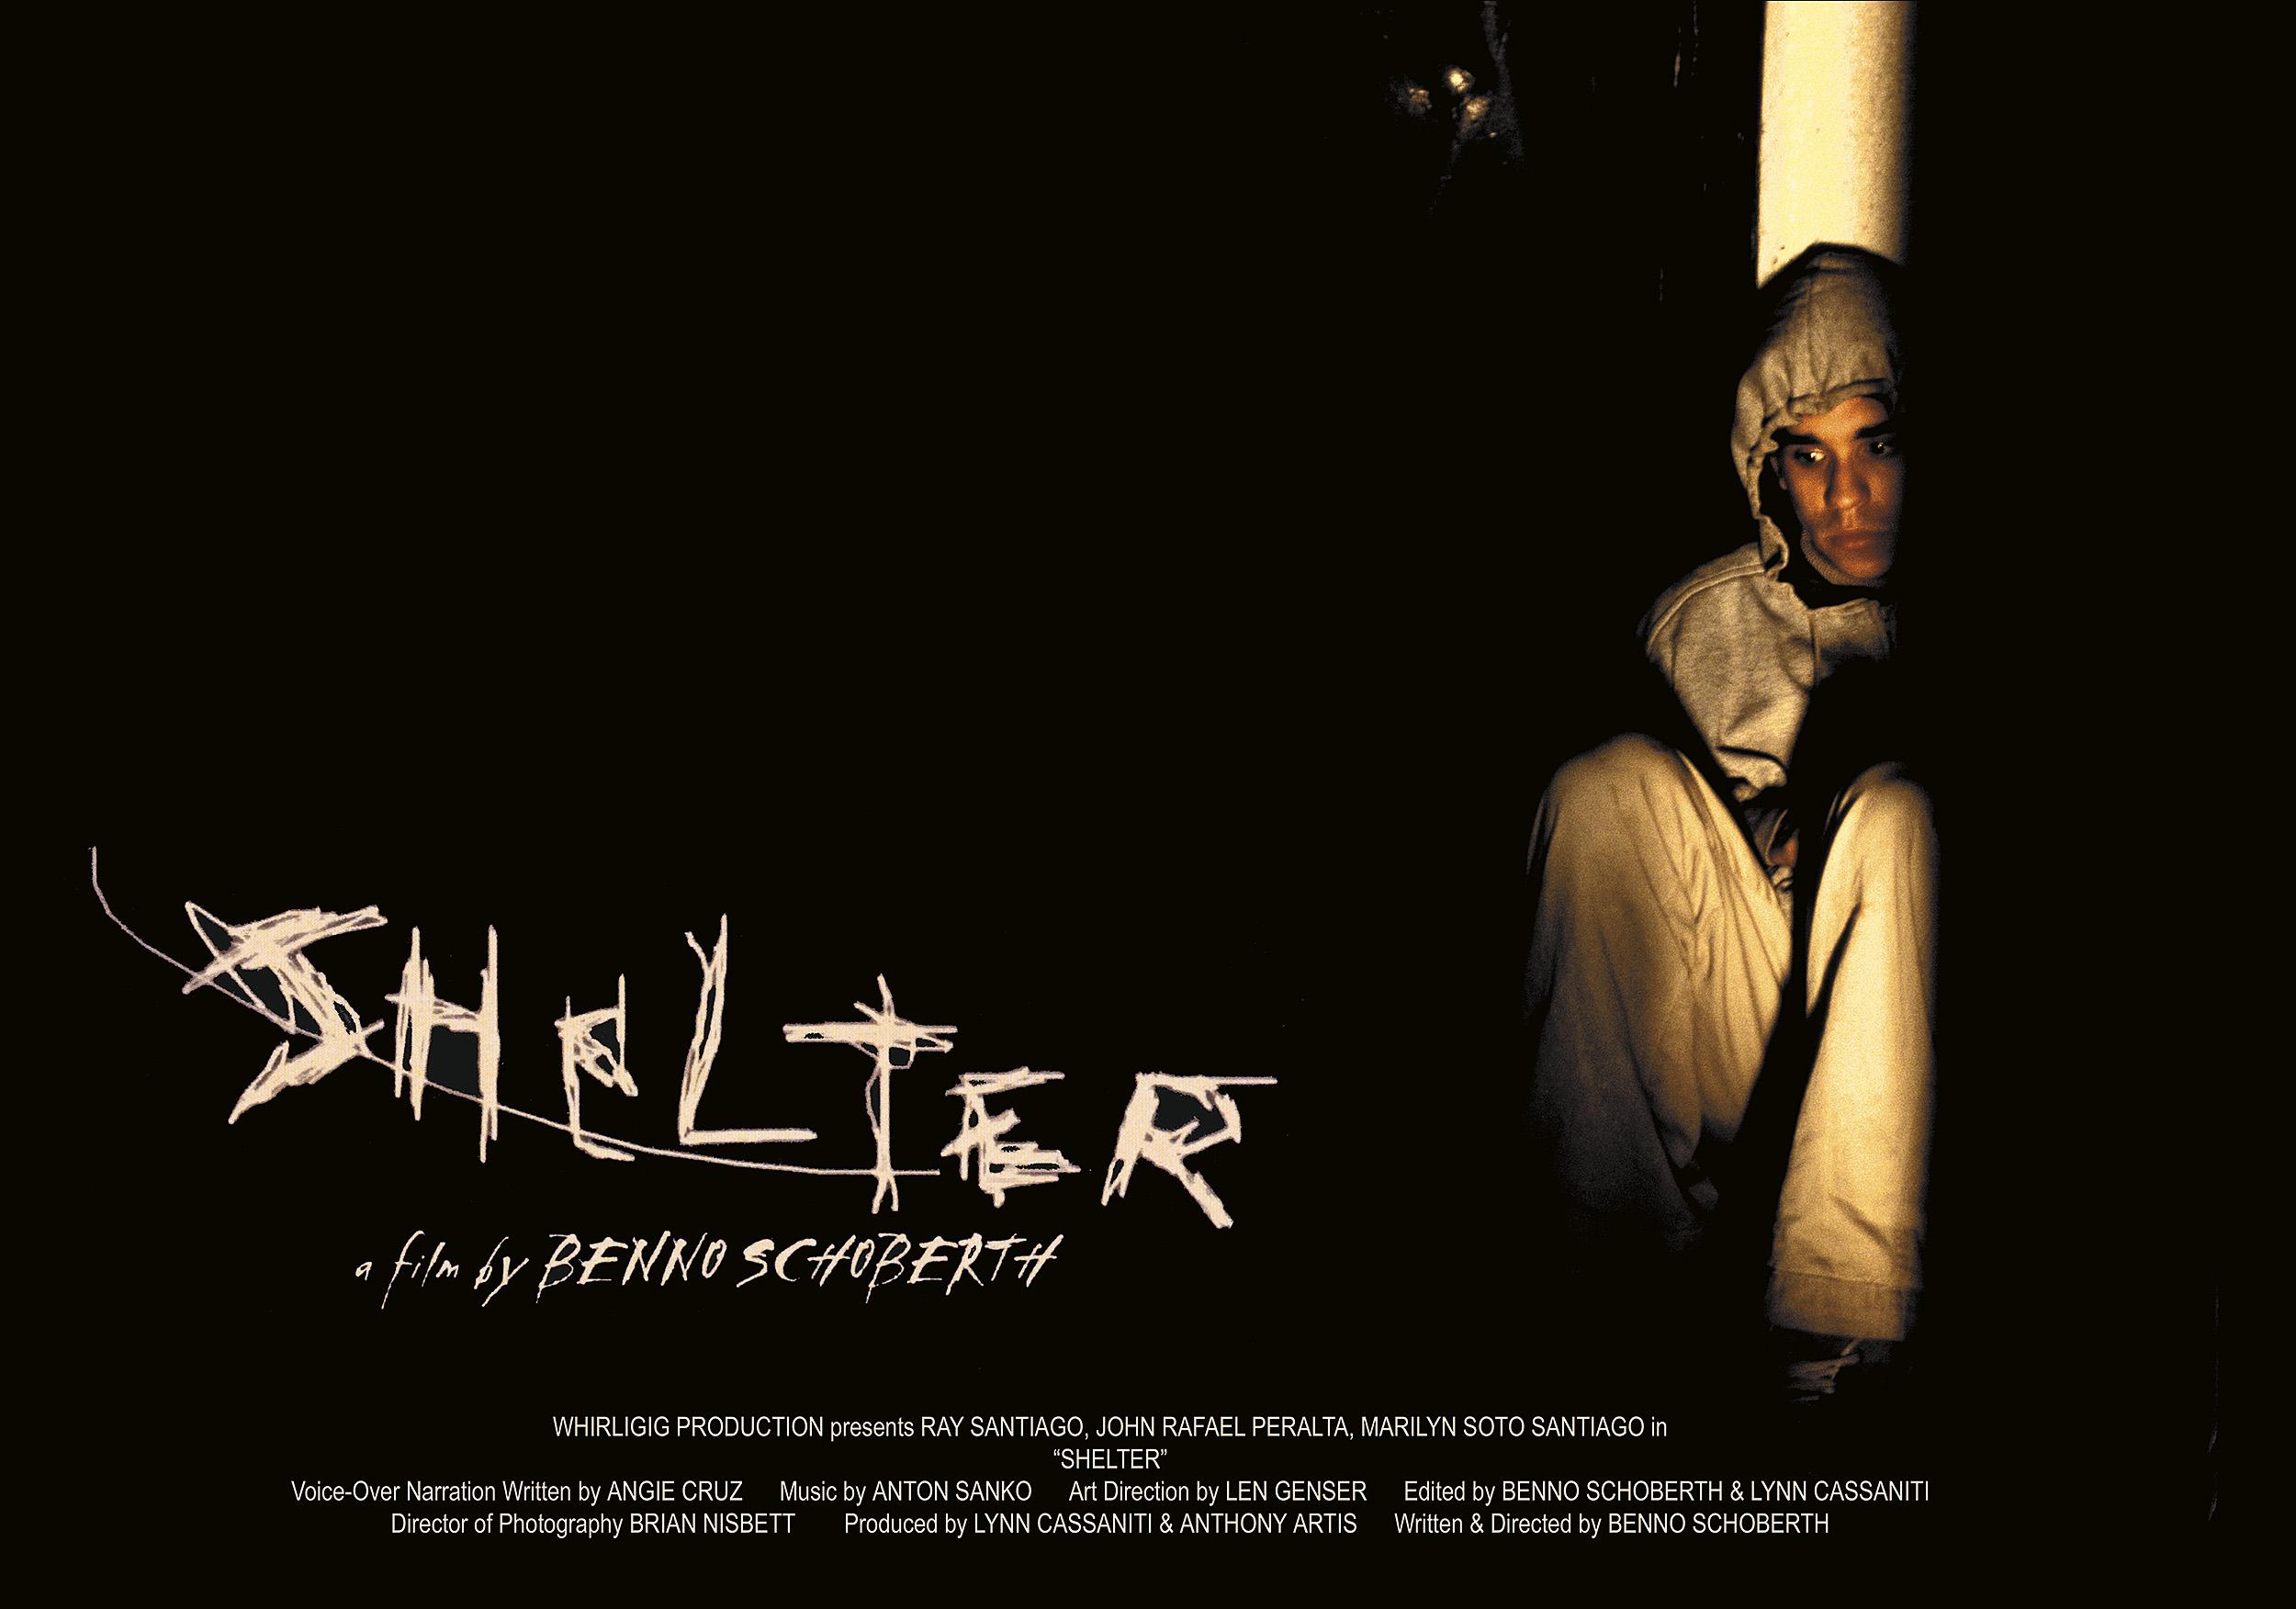 """Shelter"" Director: Benno Schoberth"